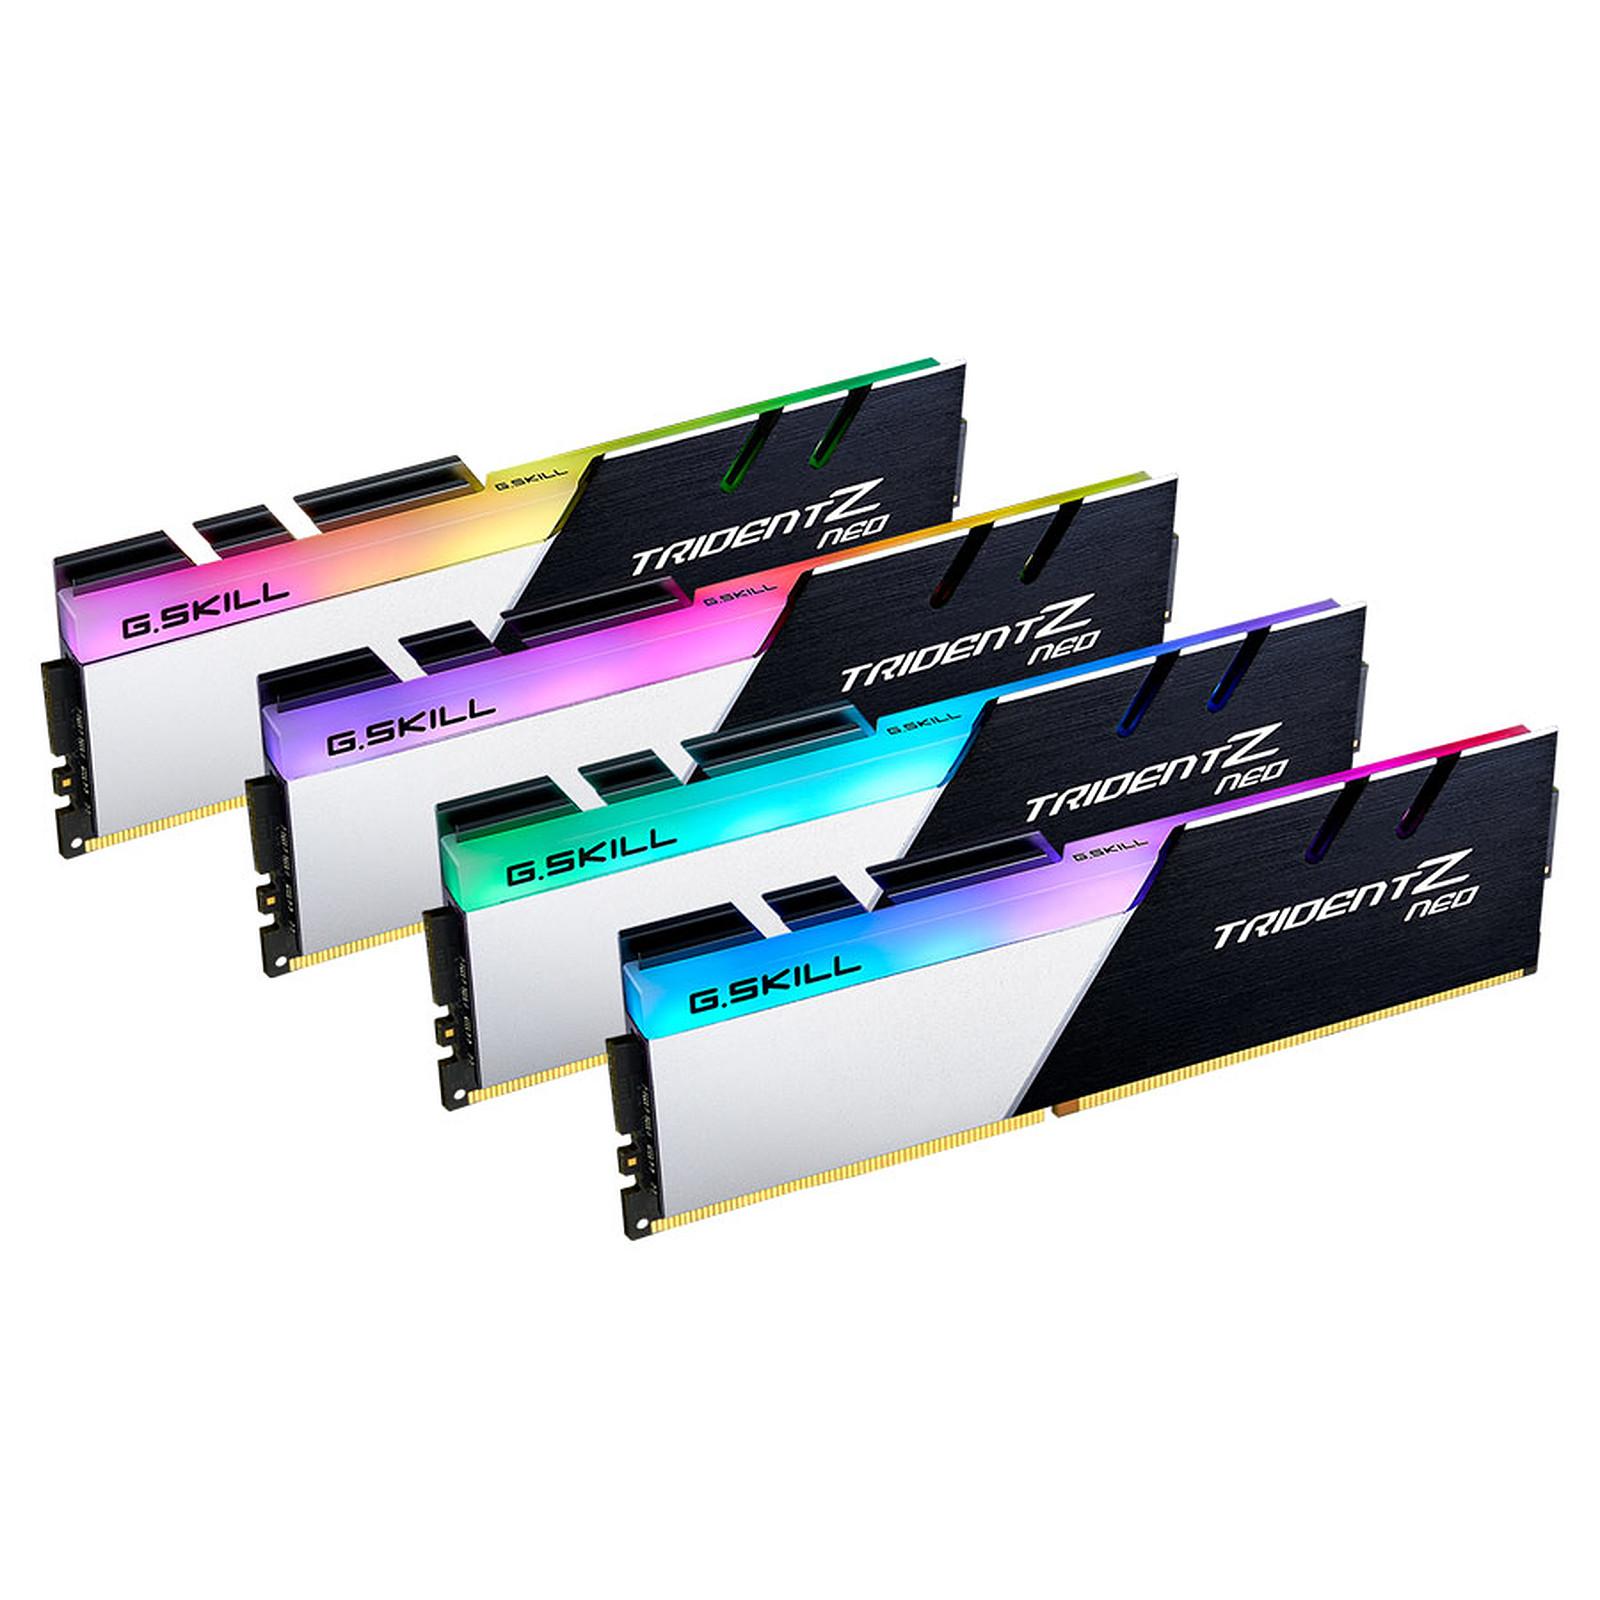 G.Skill Trident Z Neo 32 Go (4x 8 Go) DDR4 3200 MHz CL16